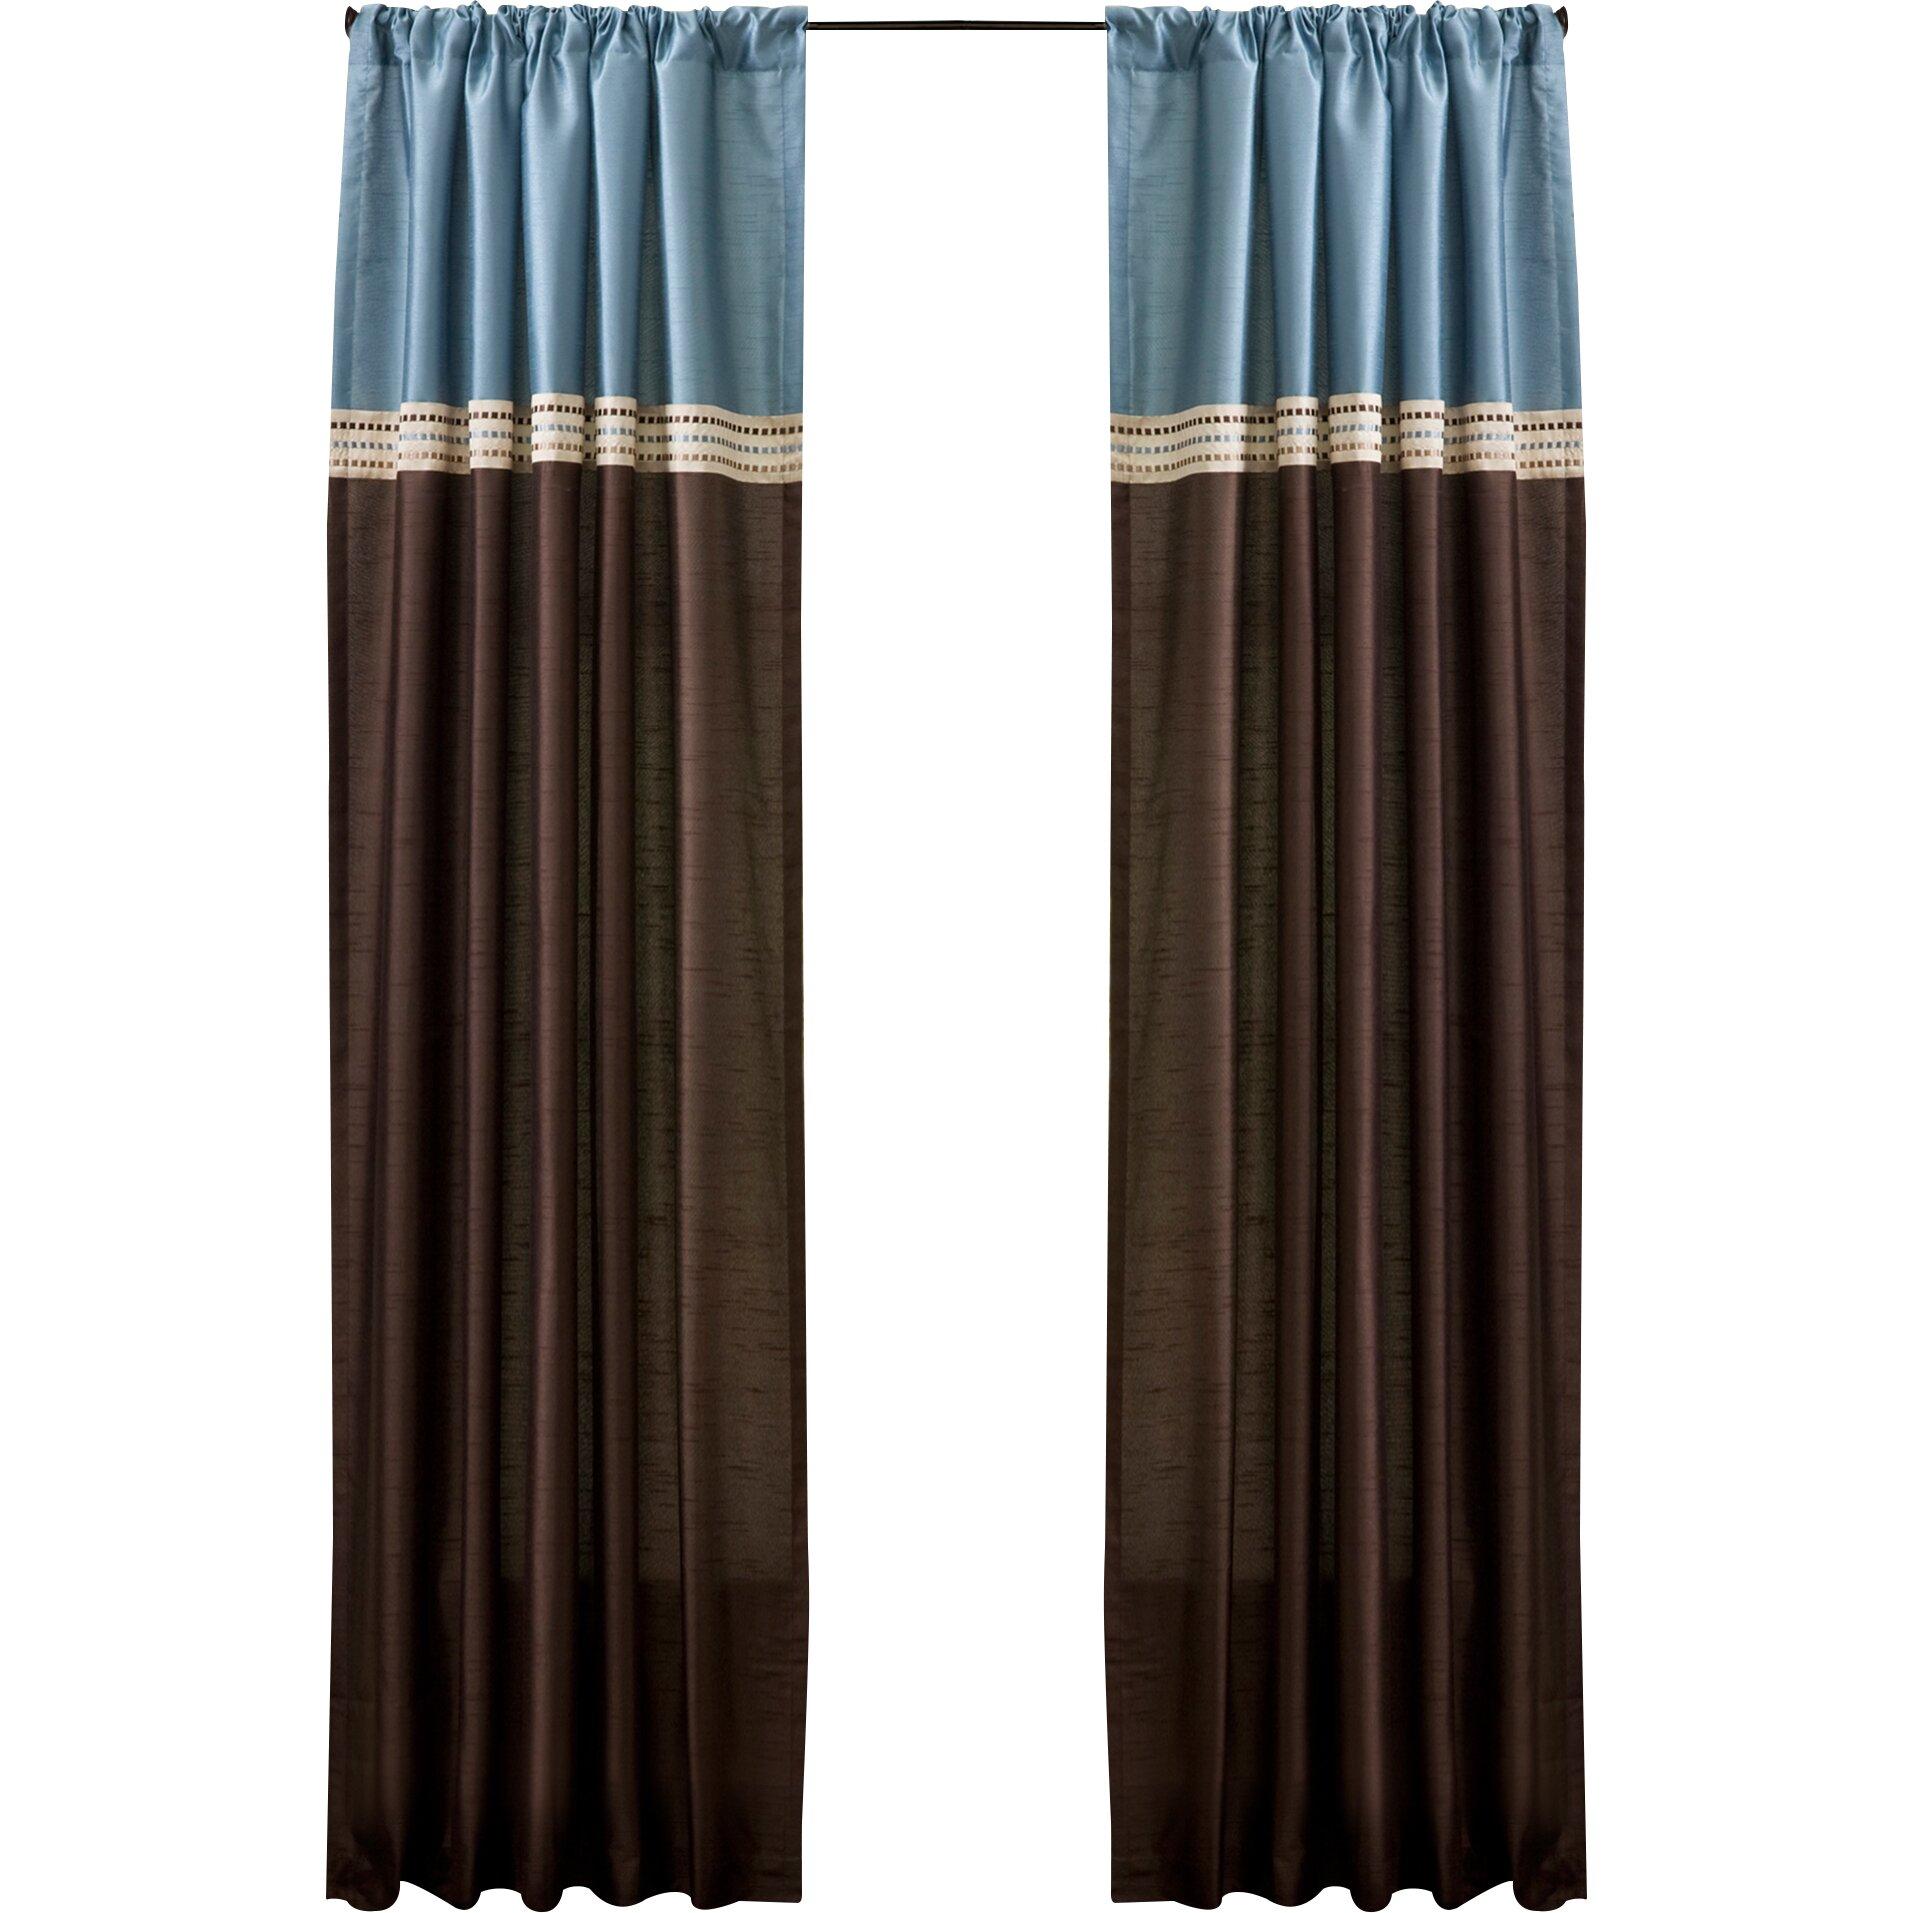 Alcott Hill Lefevre Rod Pocket Blackout Curtain Panels